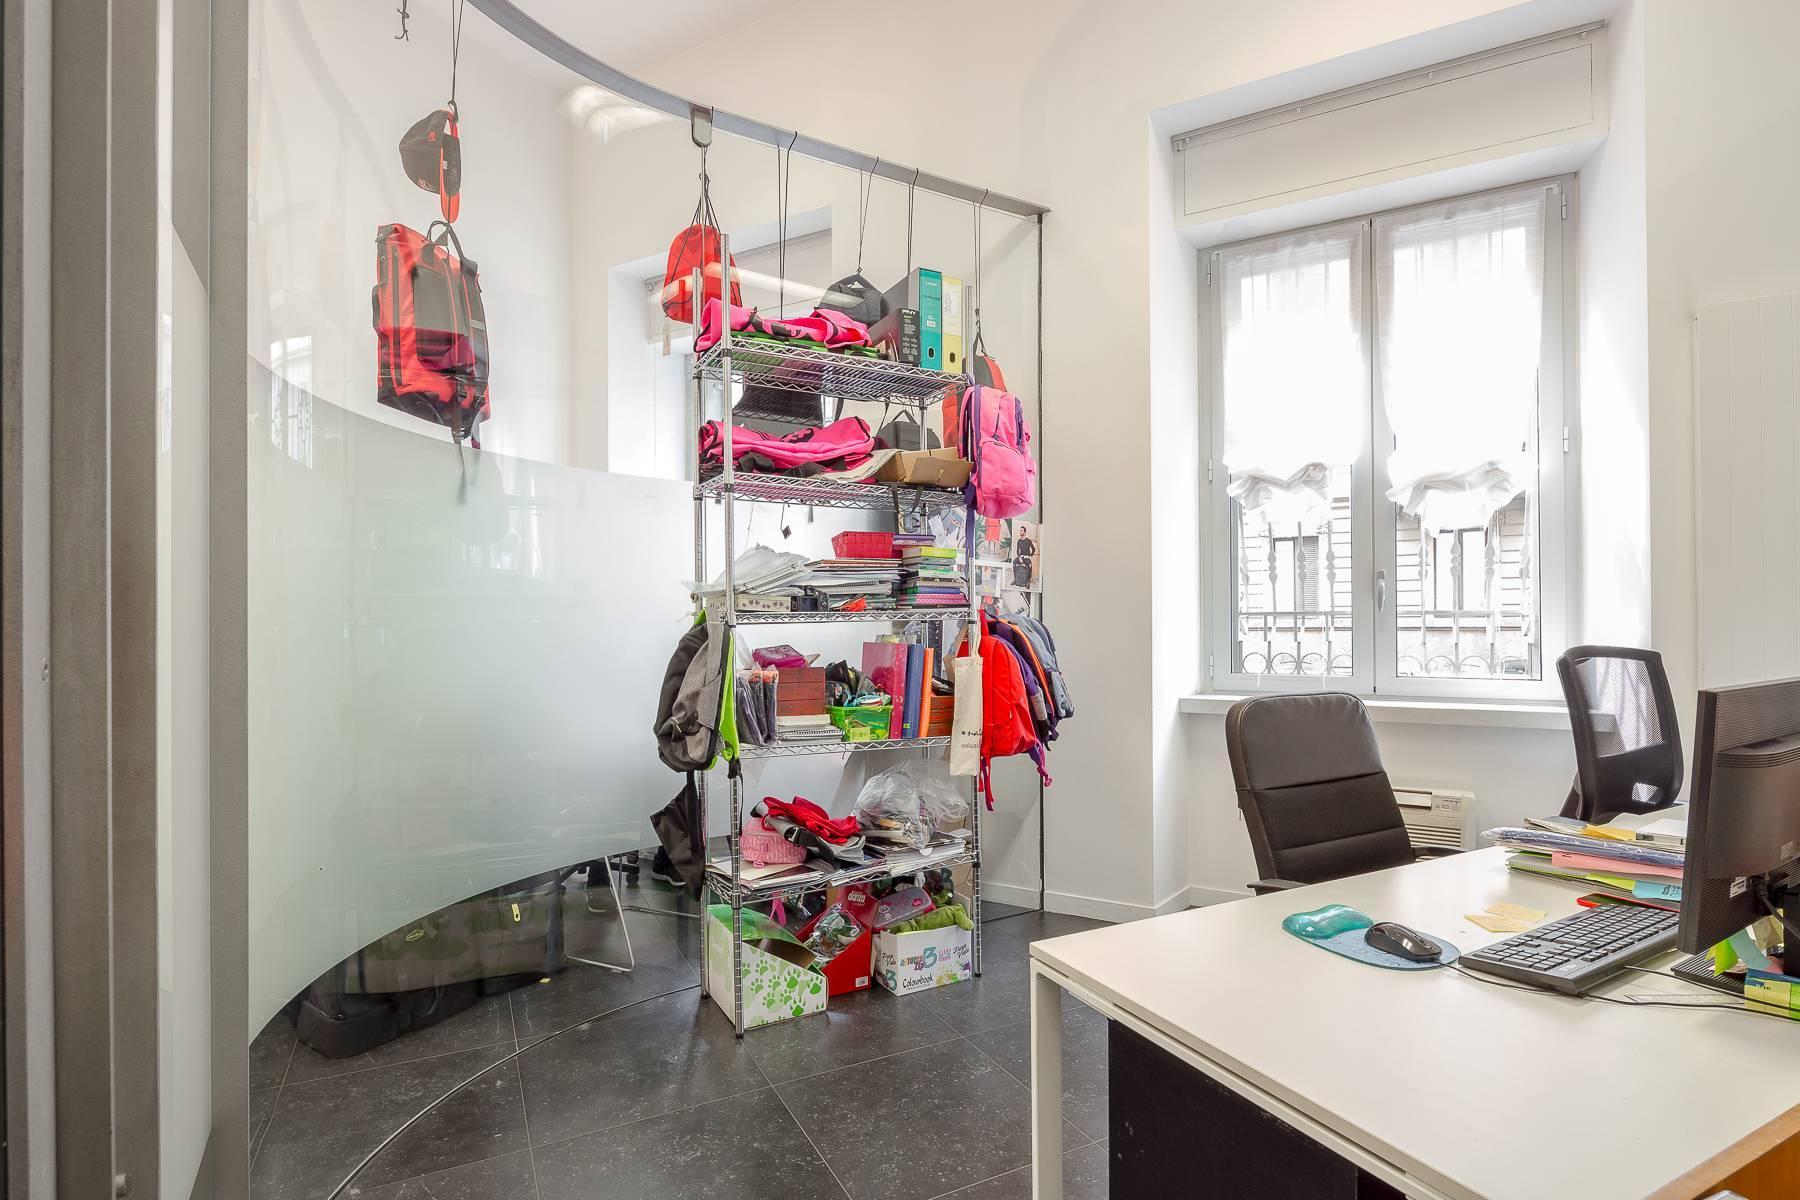 Opne-Space Büro / Wohnimmobilie auf der Piazza Giovine Italia / Via Aurelio Saffi - 12